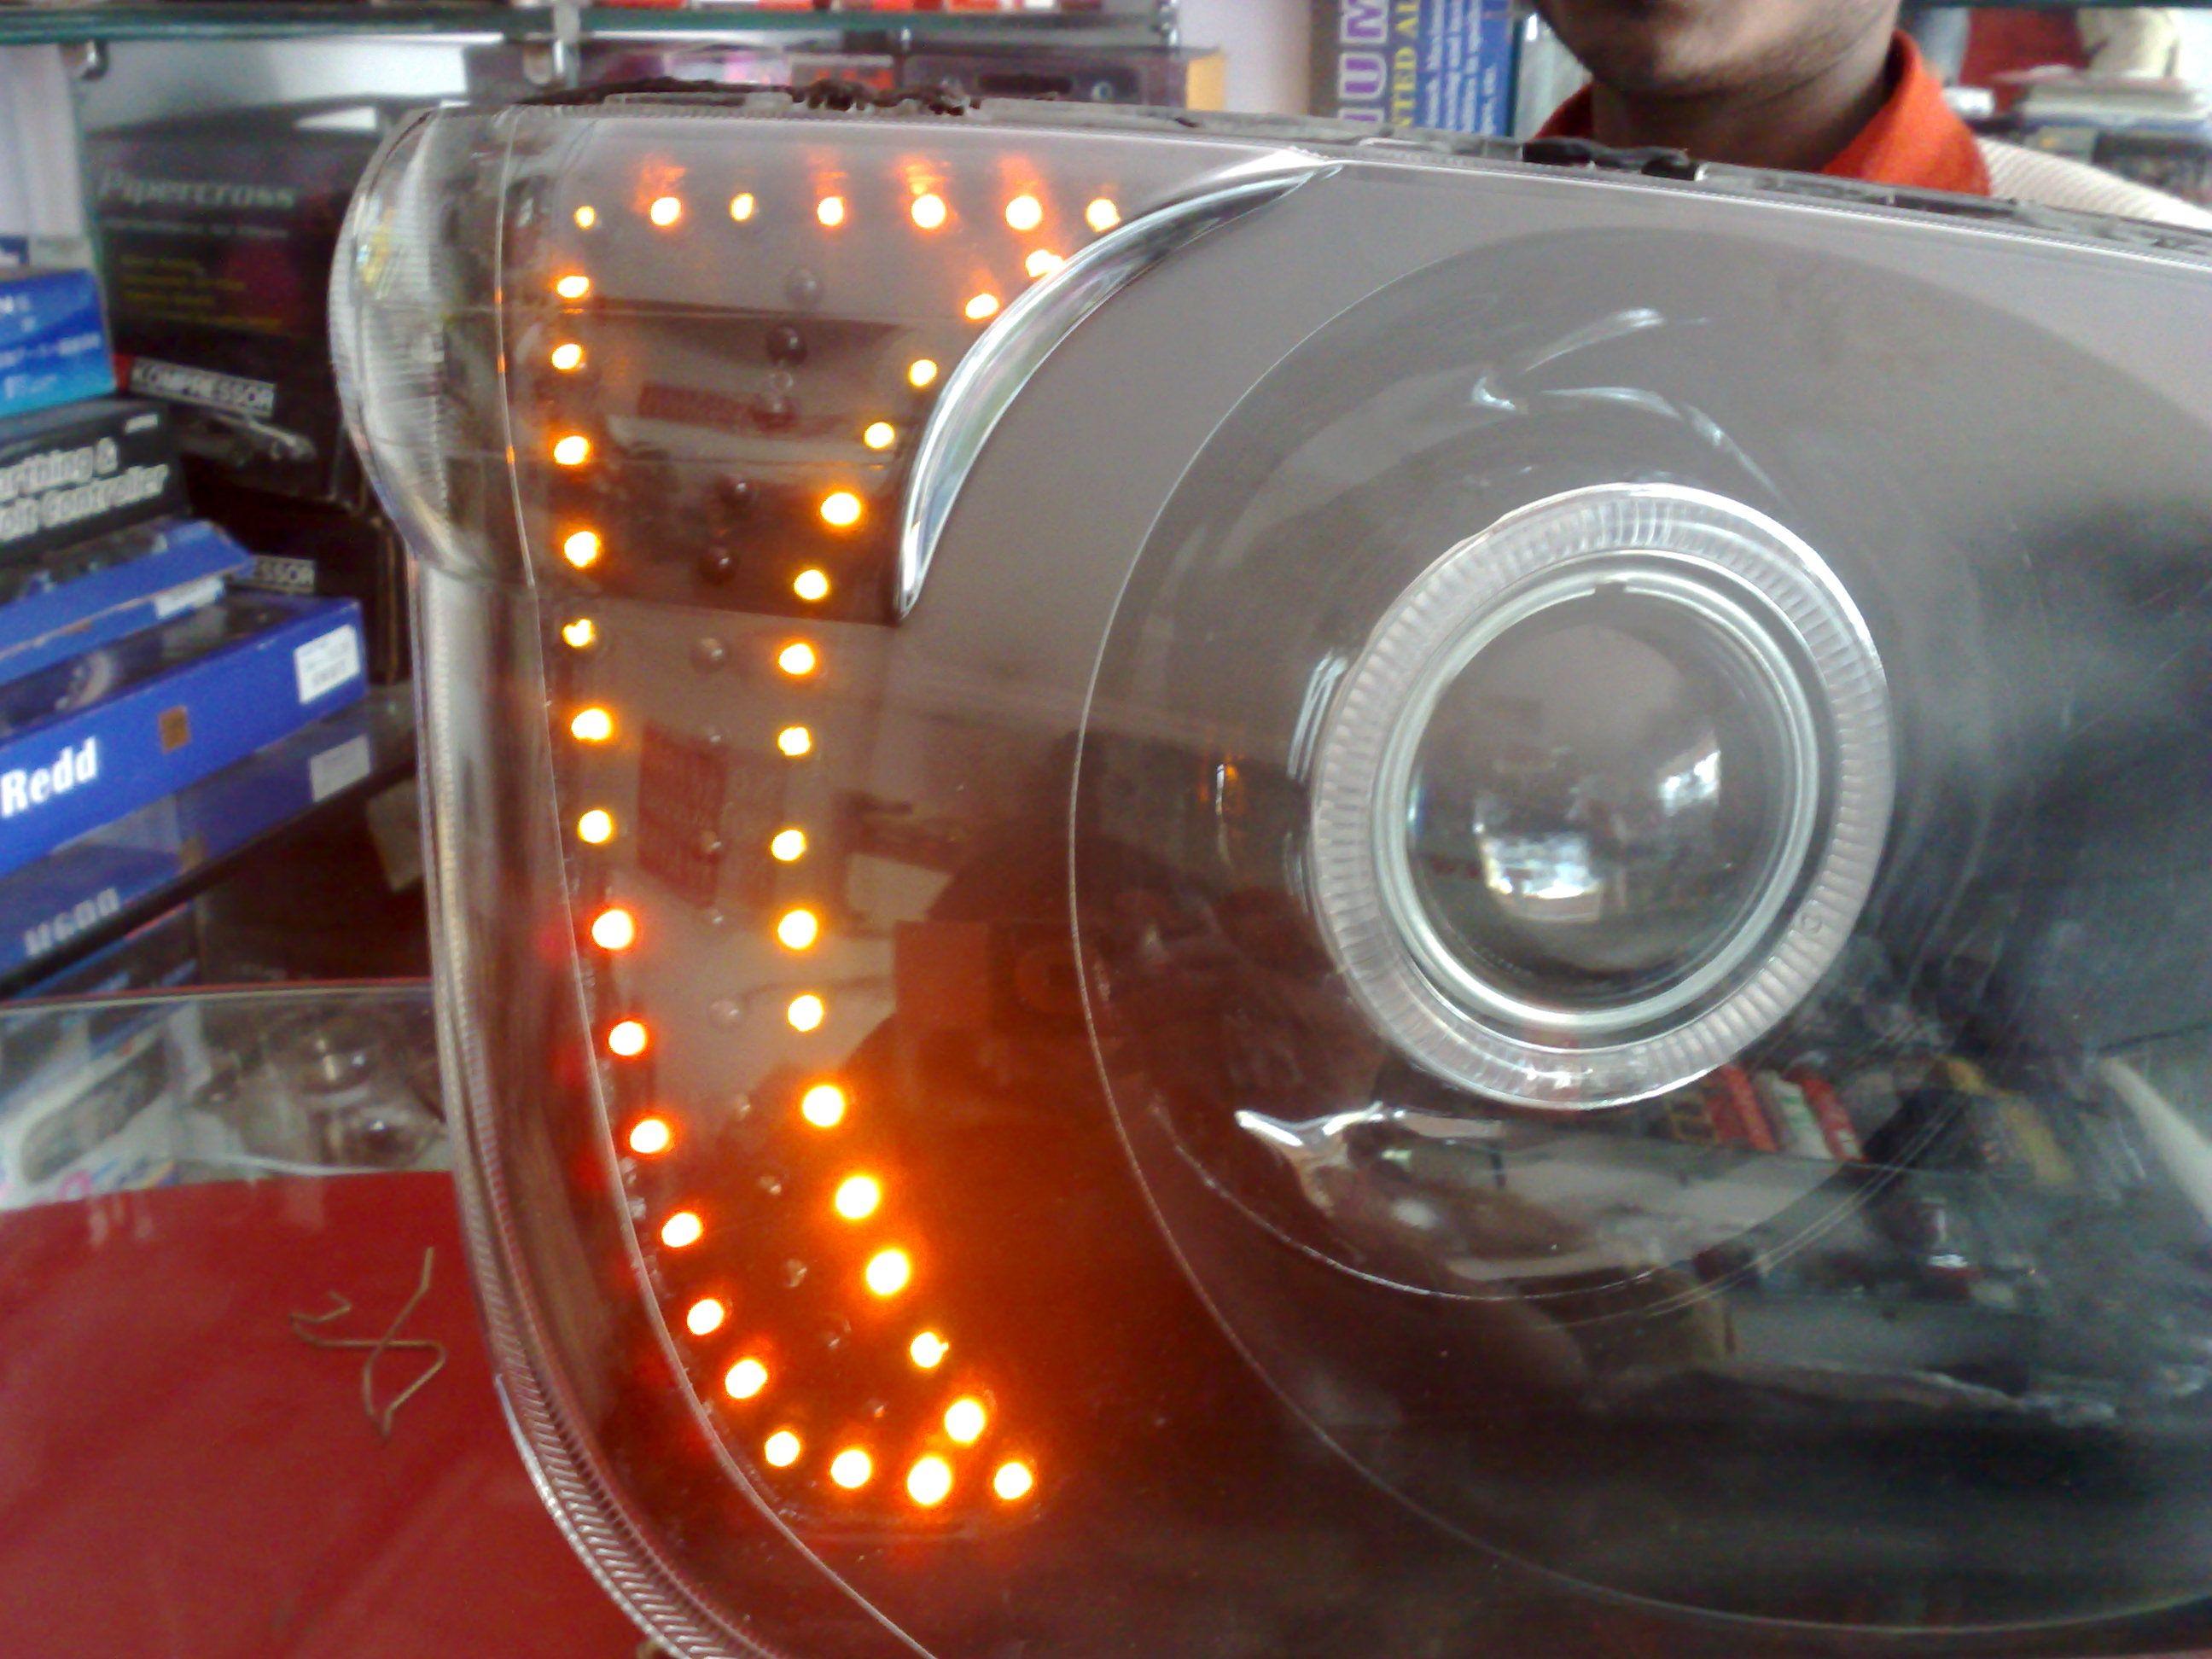 Mahindra bolero customised projector headlights with projector angel eye and leds